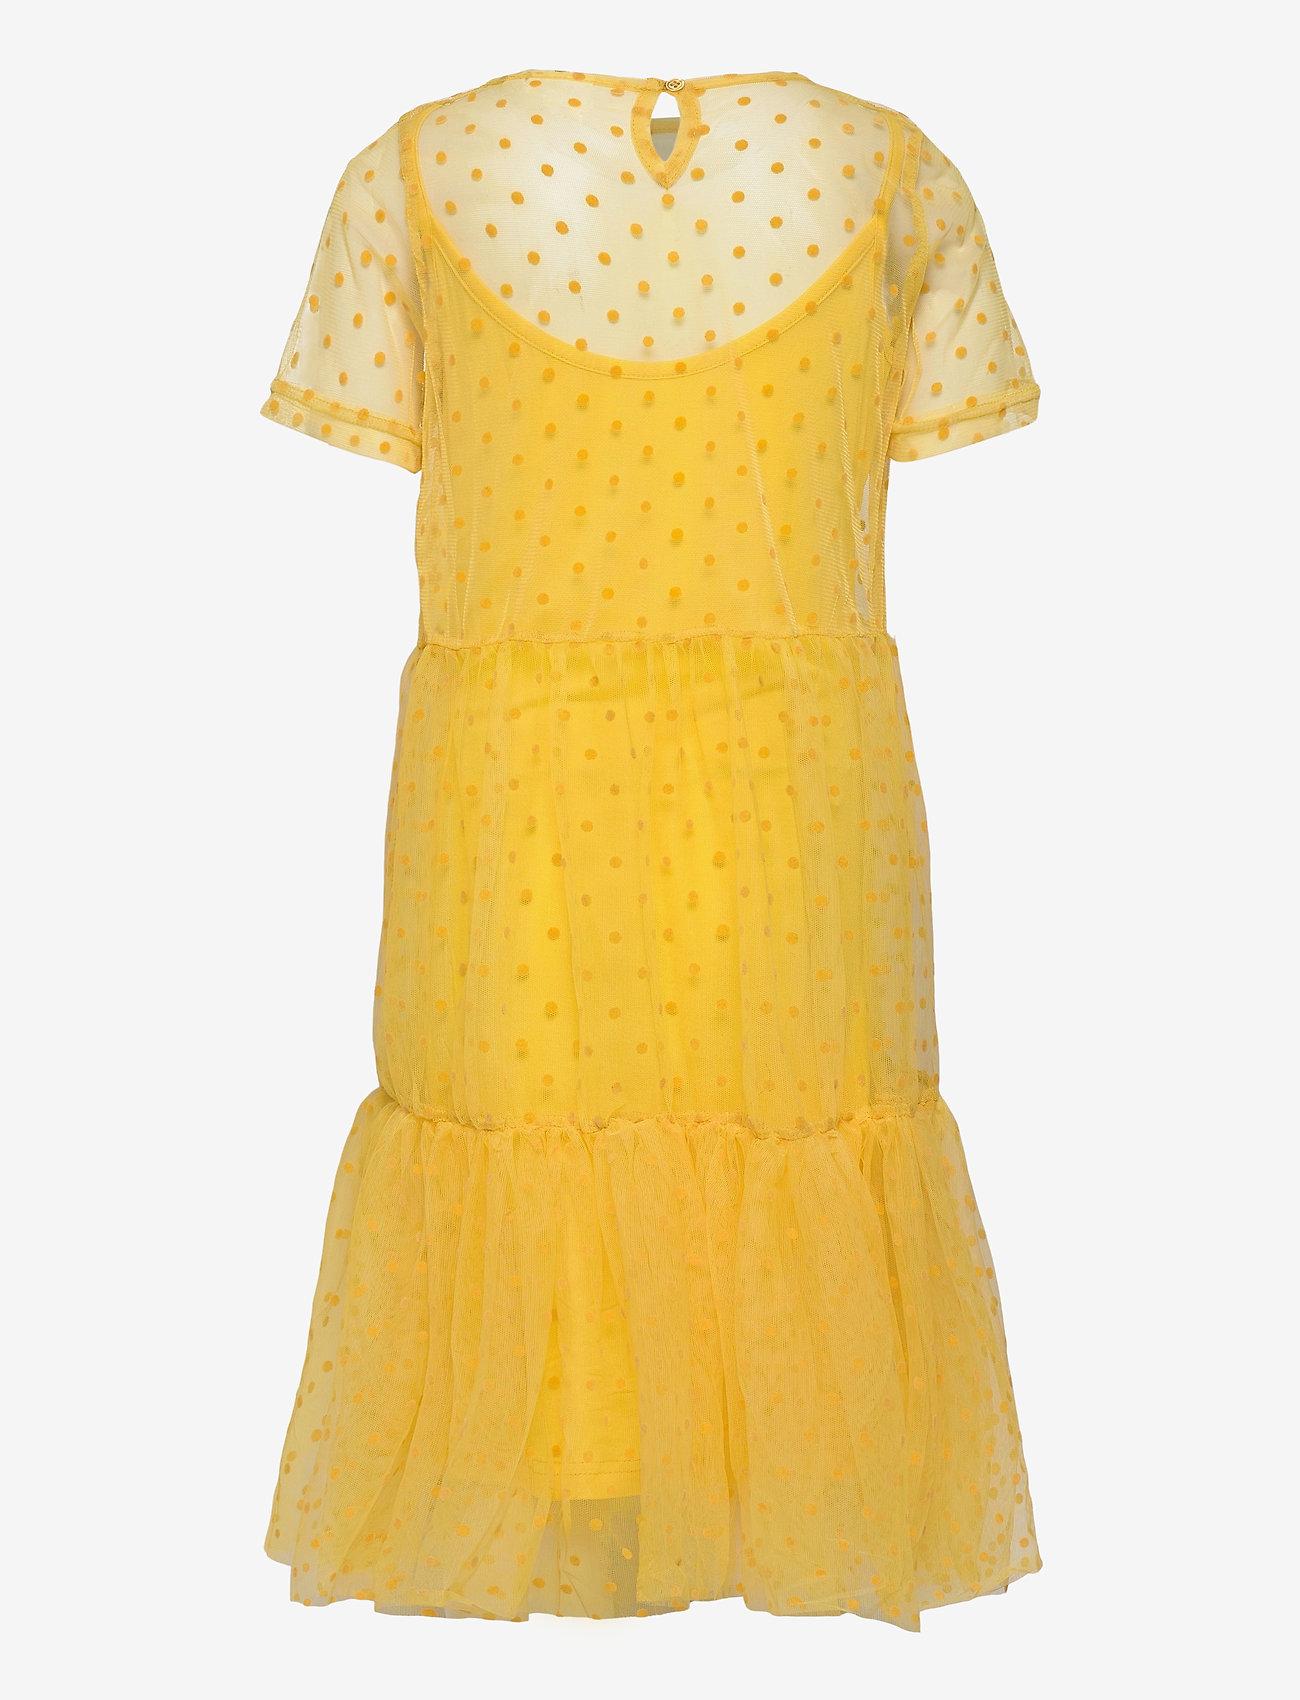 The New - UMA TWIST DRESS - kleider - primrose yellow - 1